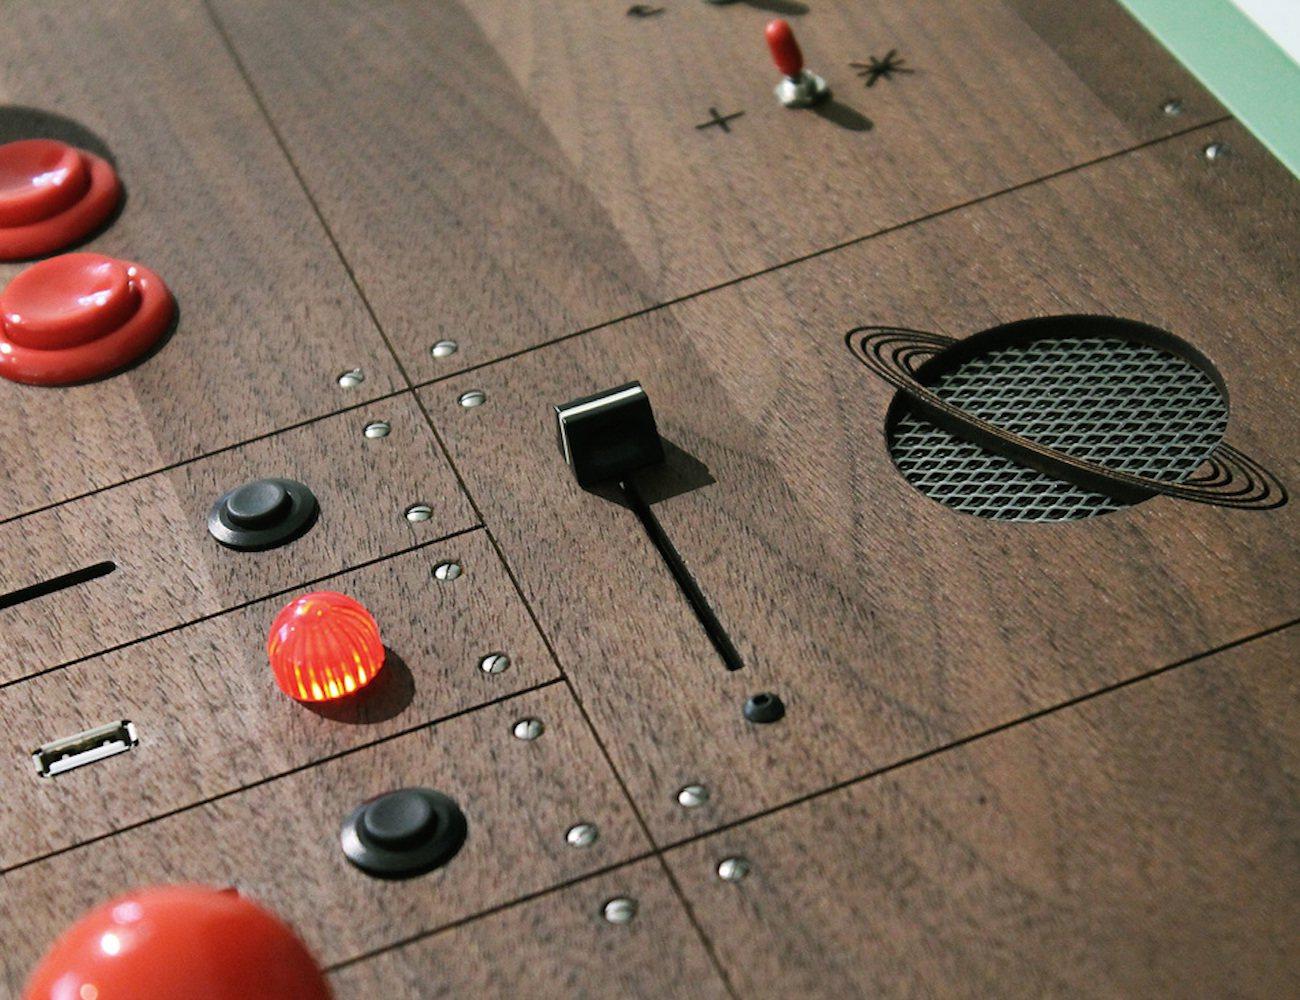 Pixelkabinett 42 – Handmade Full-Size Coin-Up Arcade Cabinet